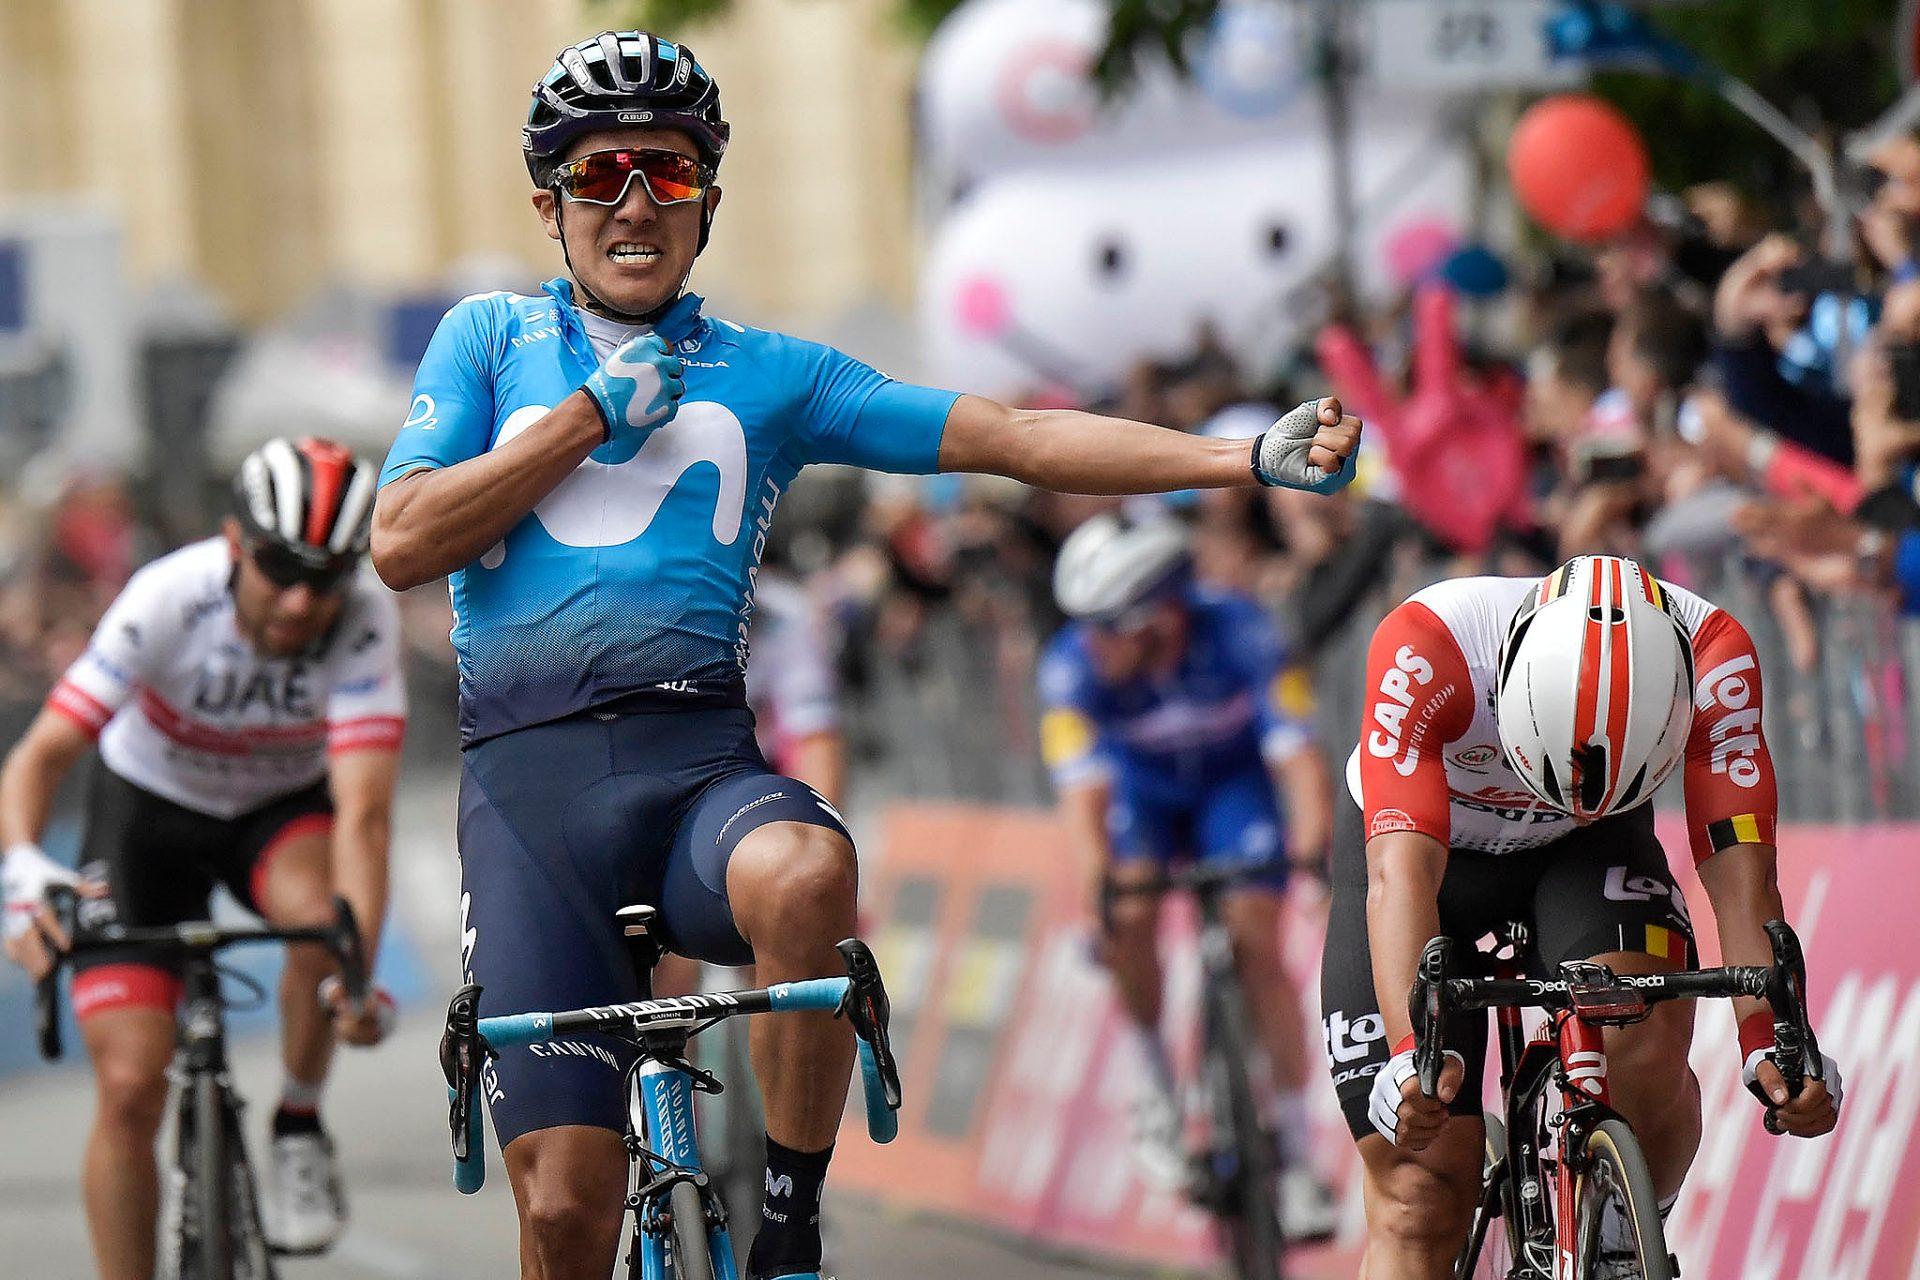 2019 Giro D'Italia Stage 4 Recap & Results 12